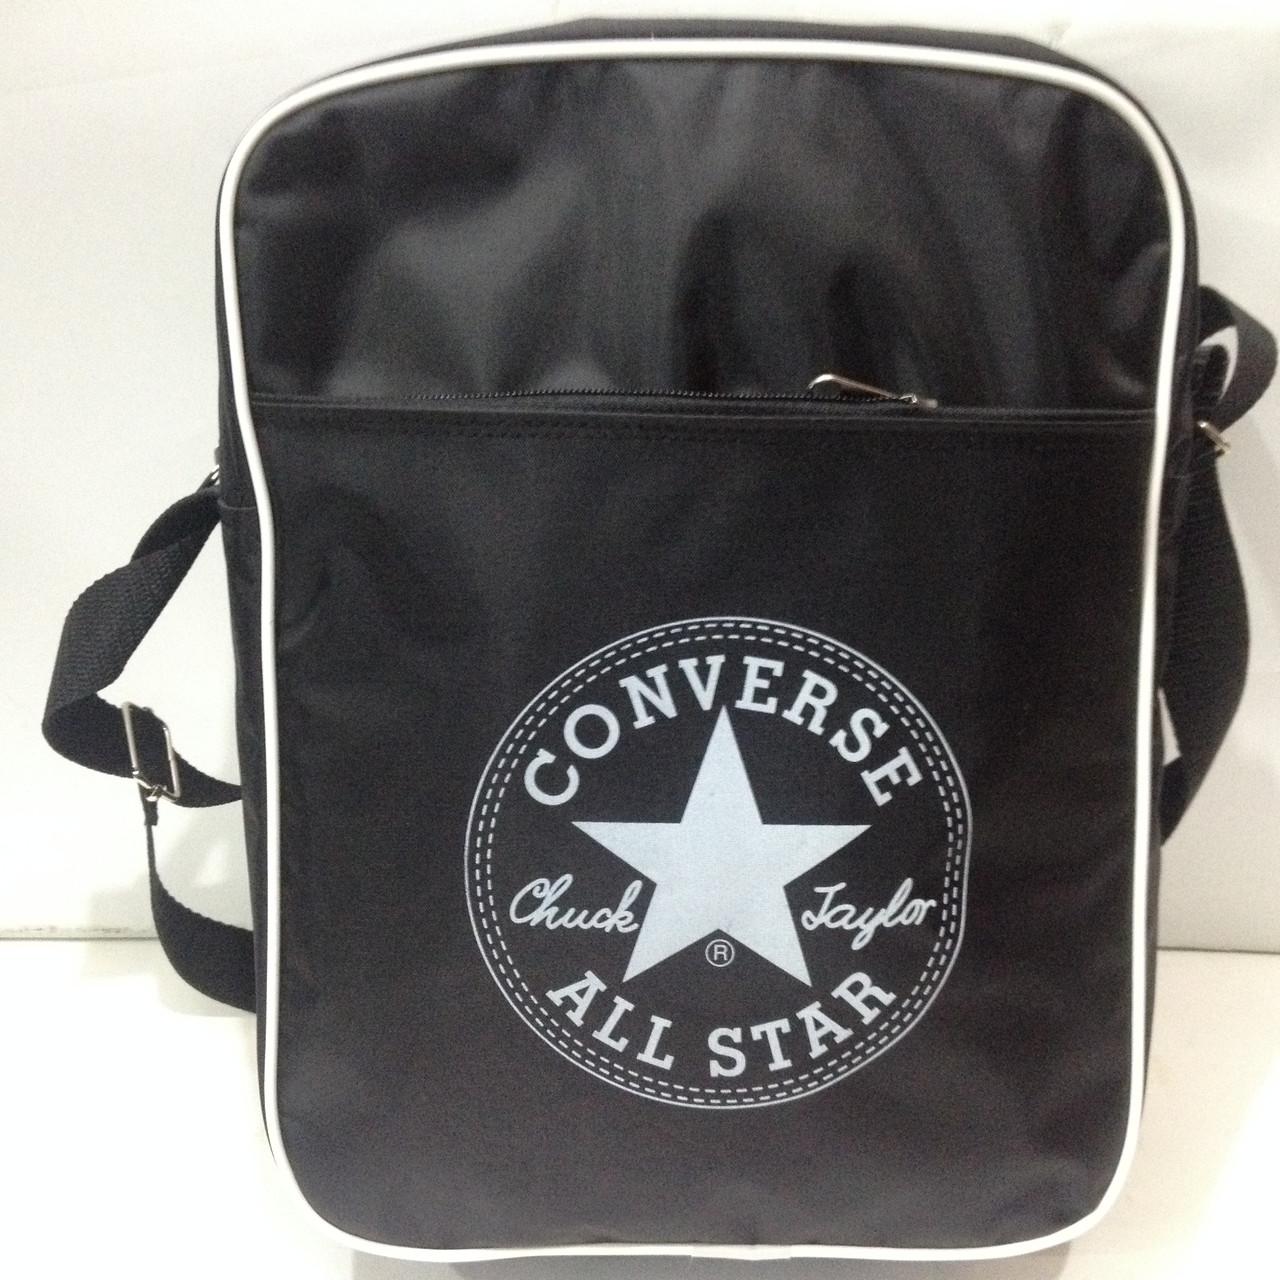 8ea24573 Сумка Converse Core Poly Cross Body(24x33cm) оптом : продажа, цена в ...